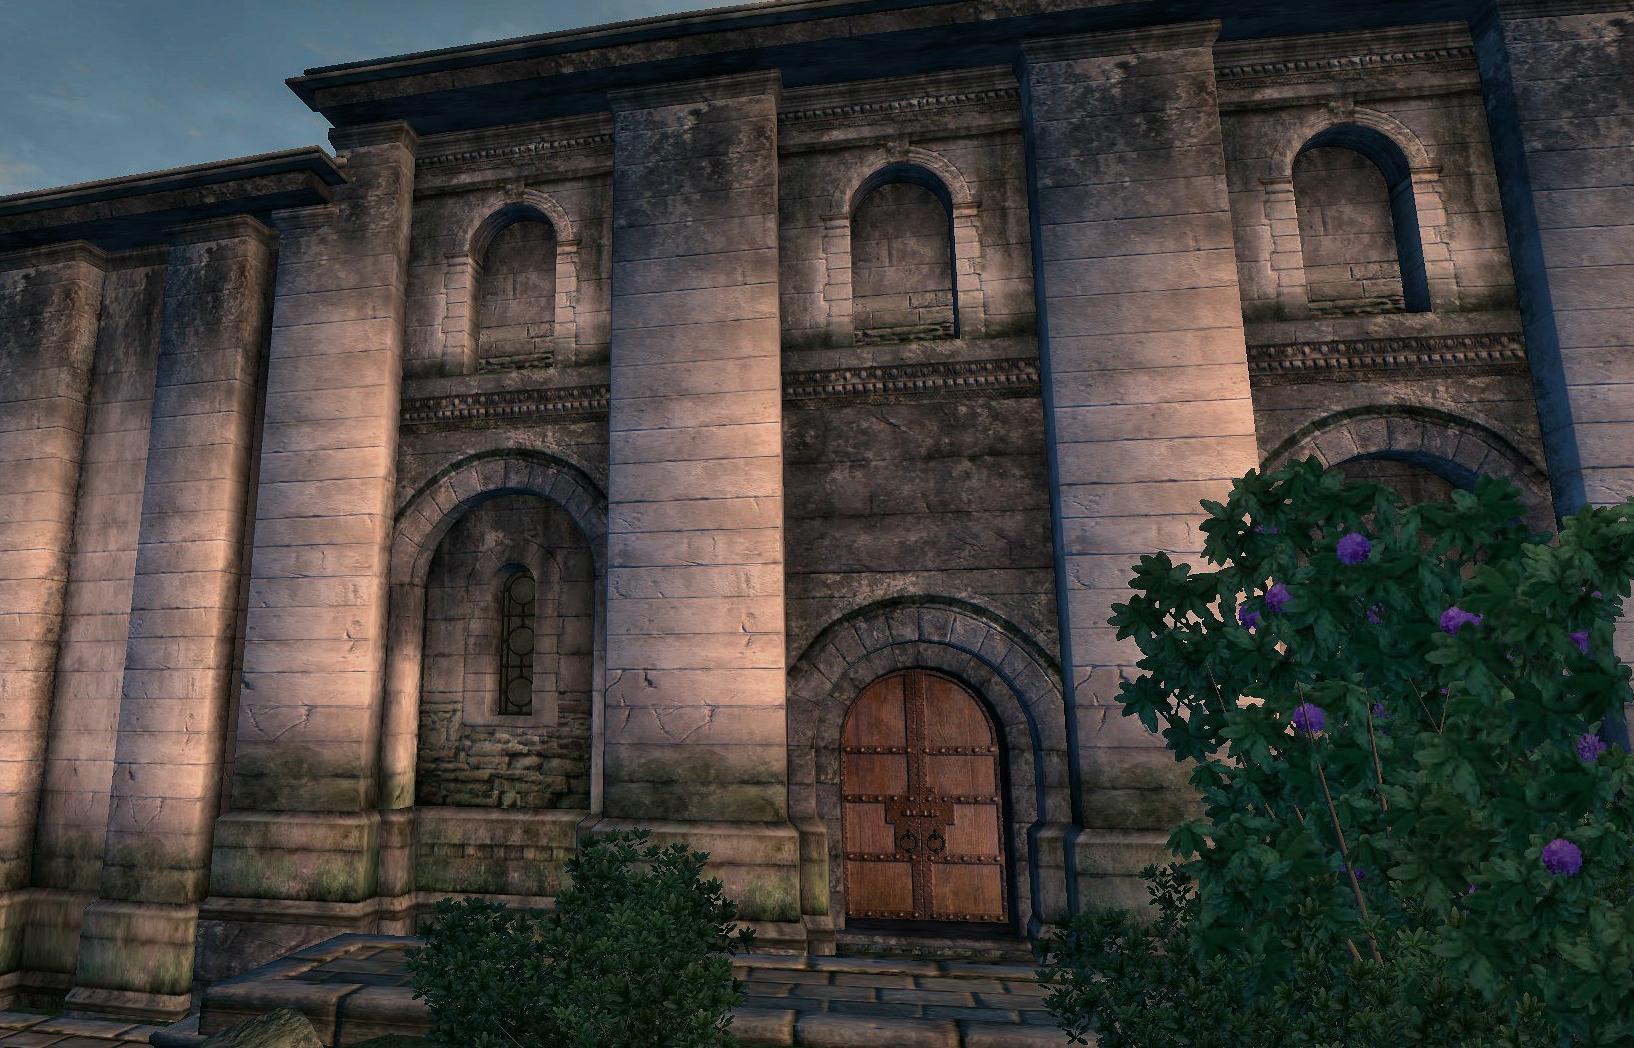 Irene Metrick's House